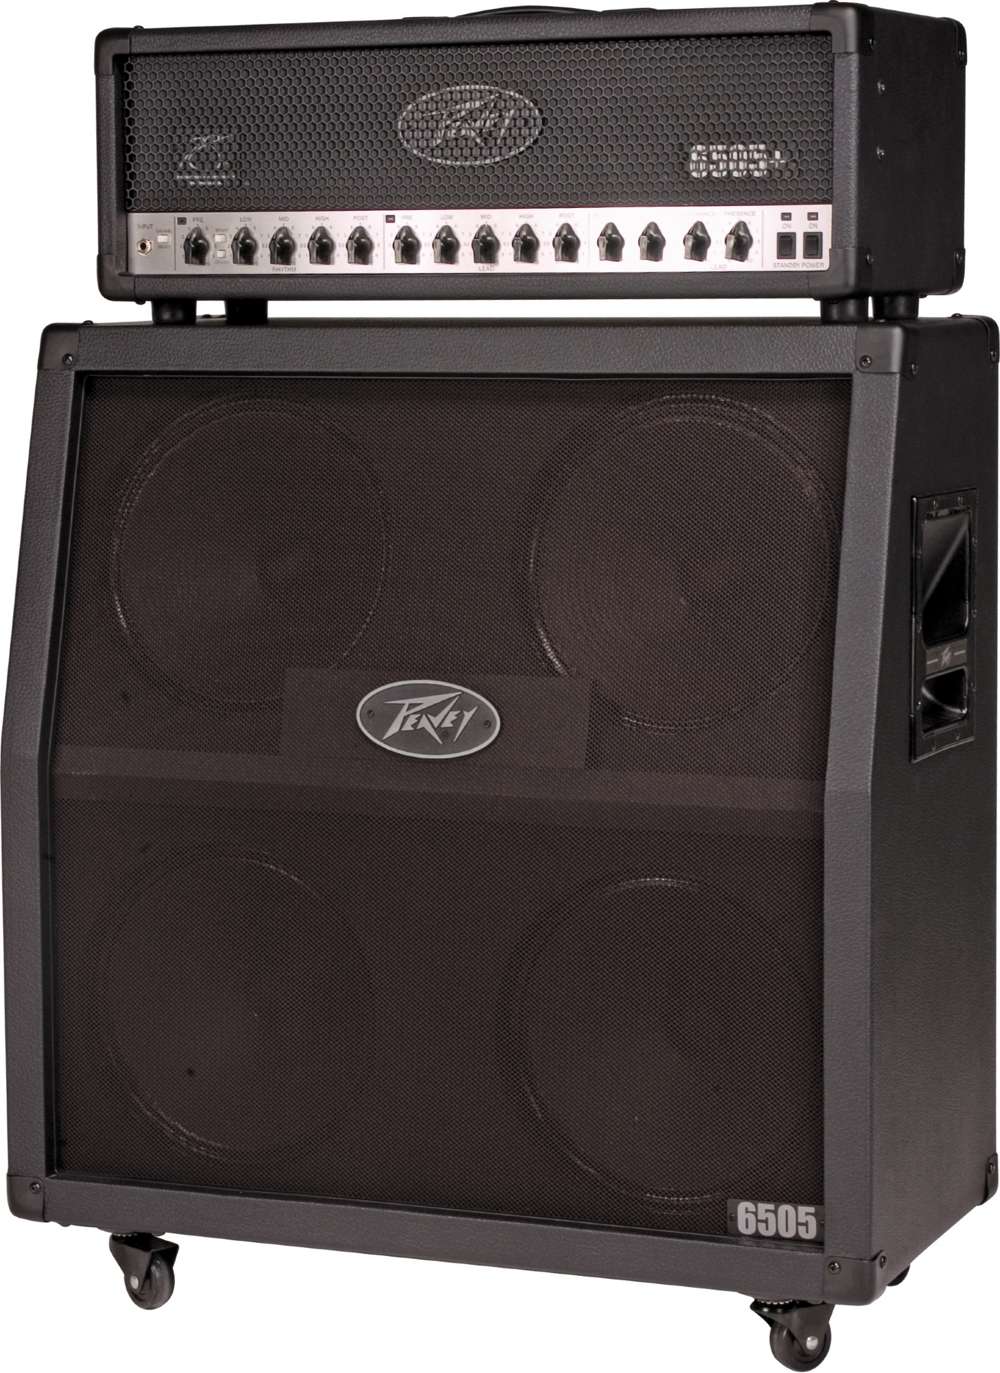 6505 120w tube guitar amp head and 300w 4x12 speaker cab half stack ebay. Black Bedroom Furniture Sets. Home Design Ideas